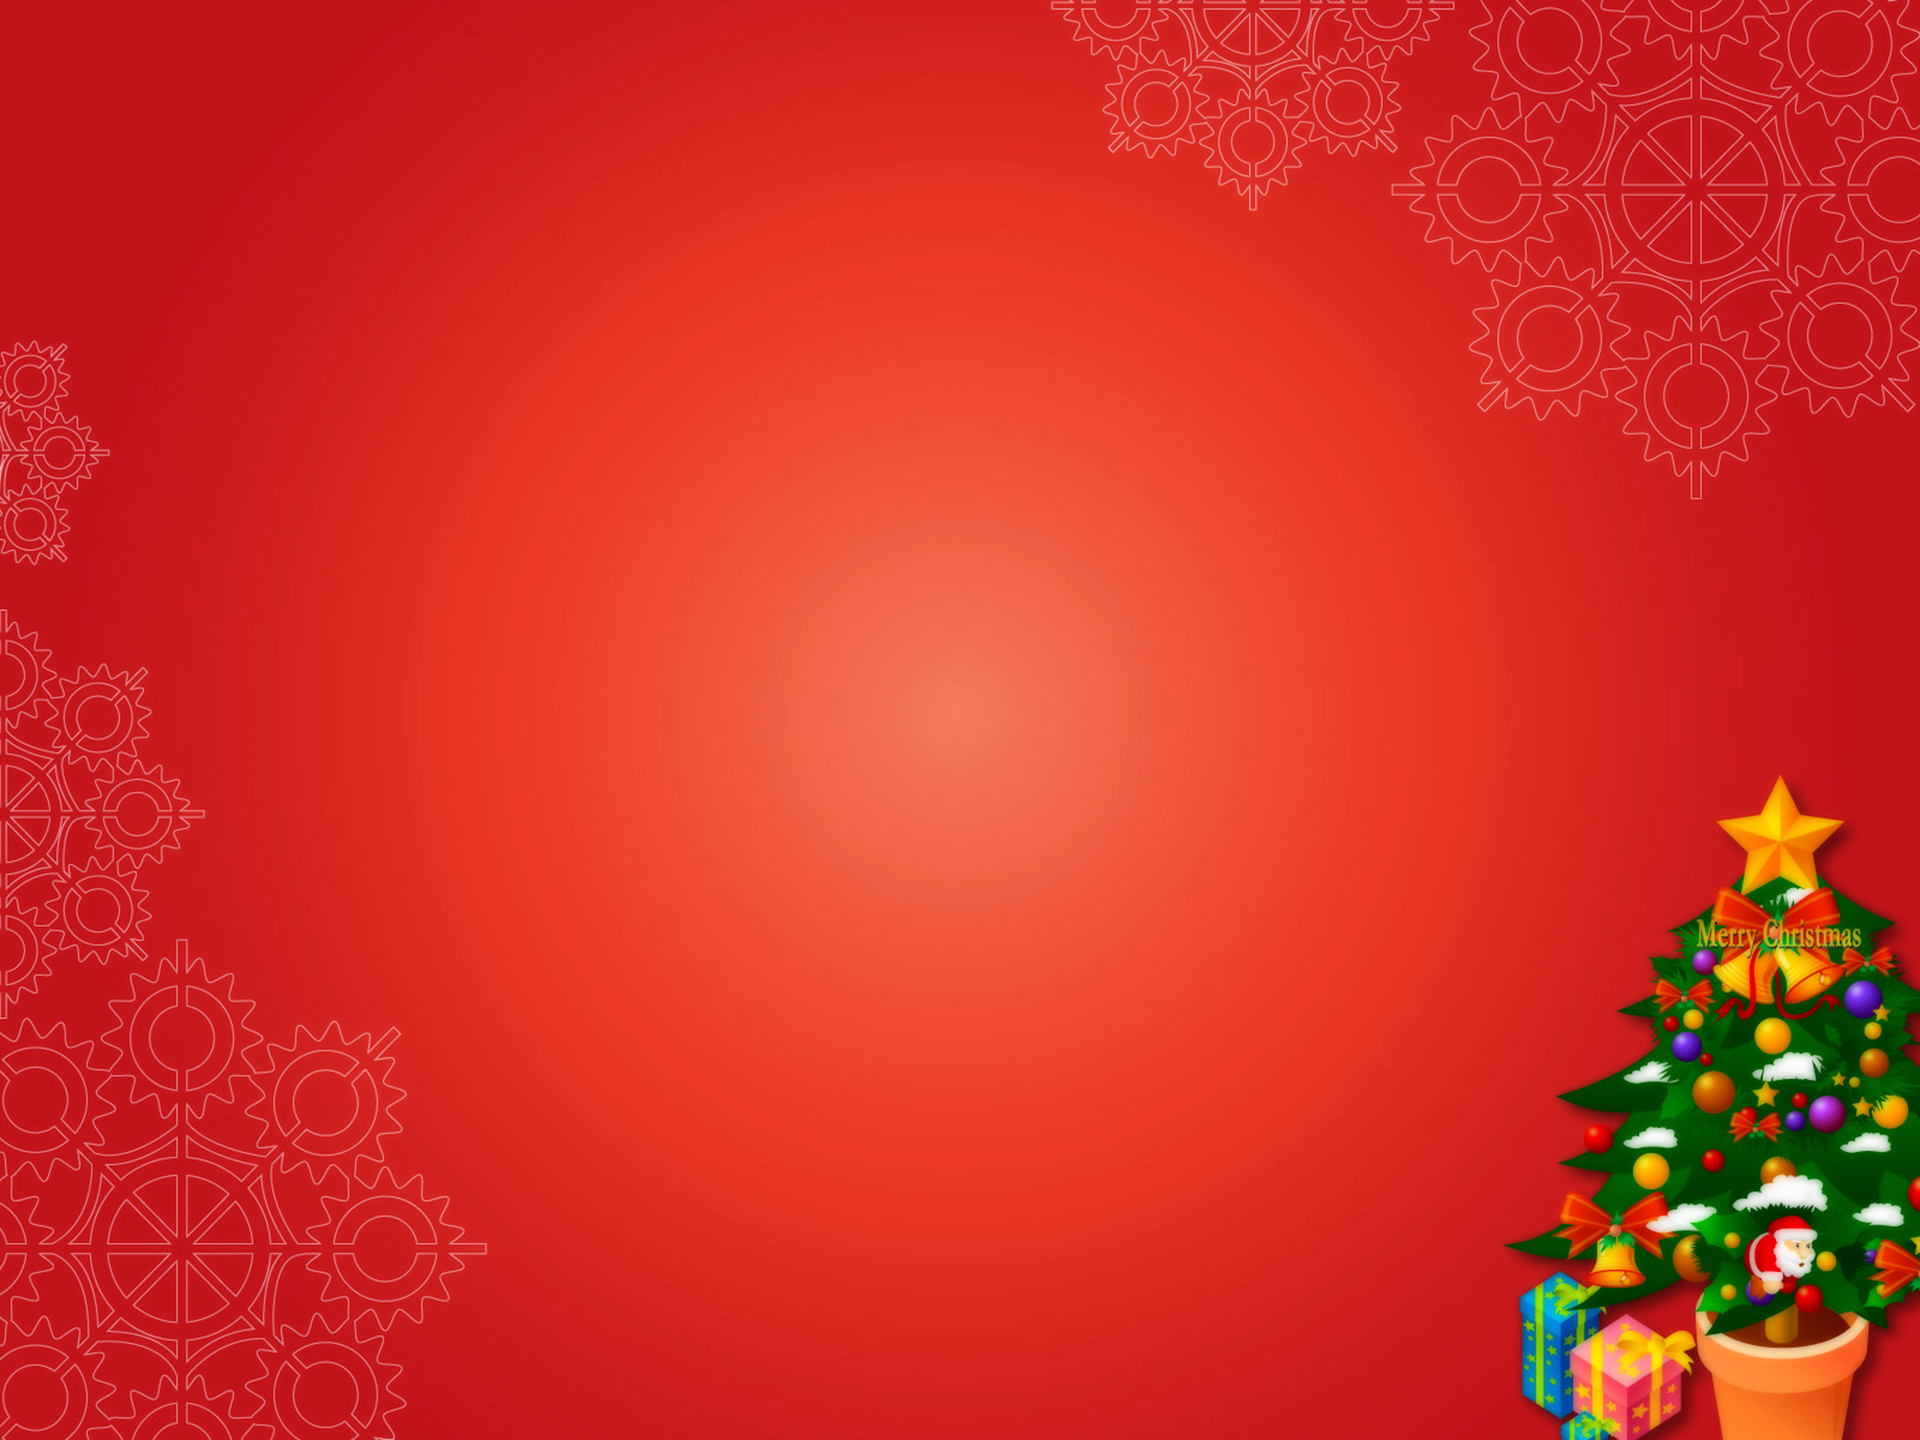 Фон новогодний на открытку, подруге картинках стихах